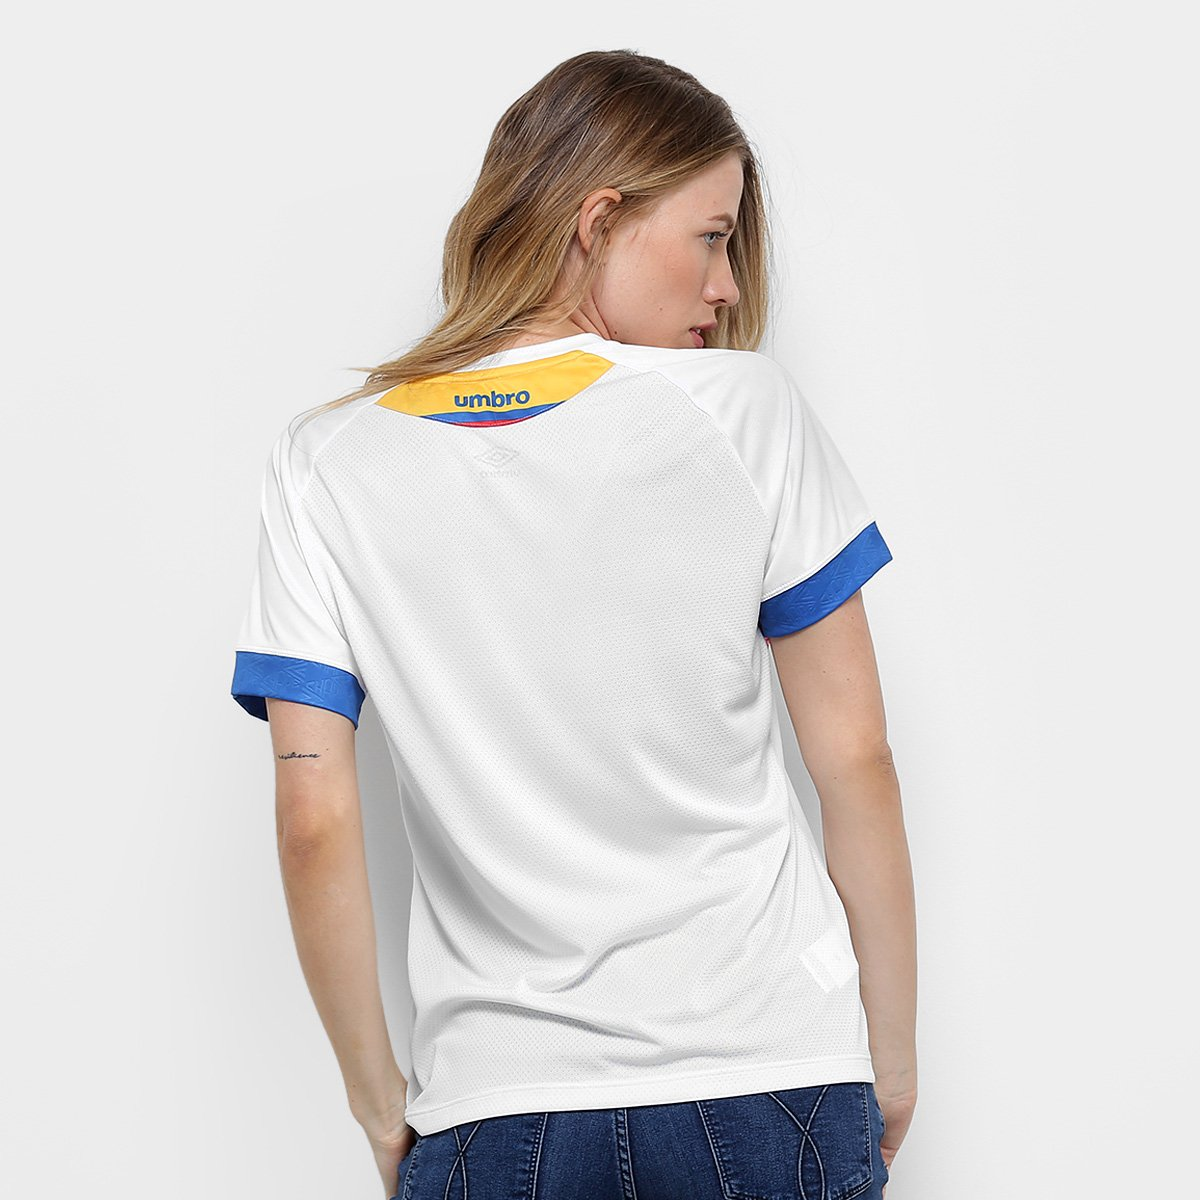 Branco Torcedor La Feminina s e Azul Umbro Chapecoense II Pasion 2018 Camisa n° OqF0vXw